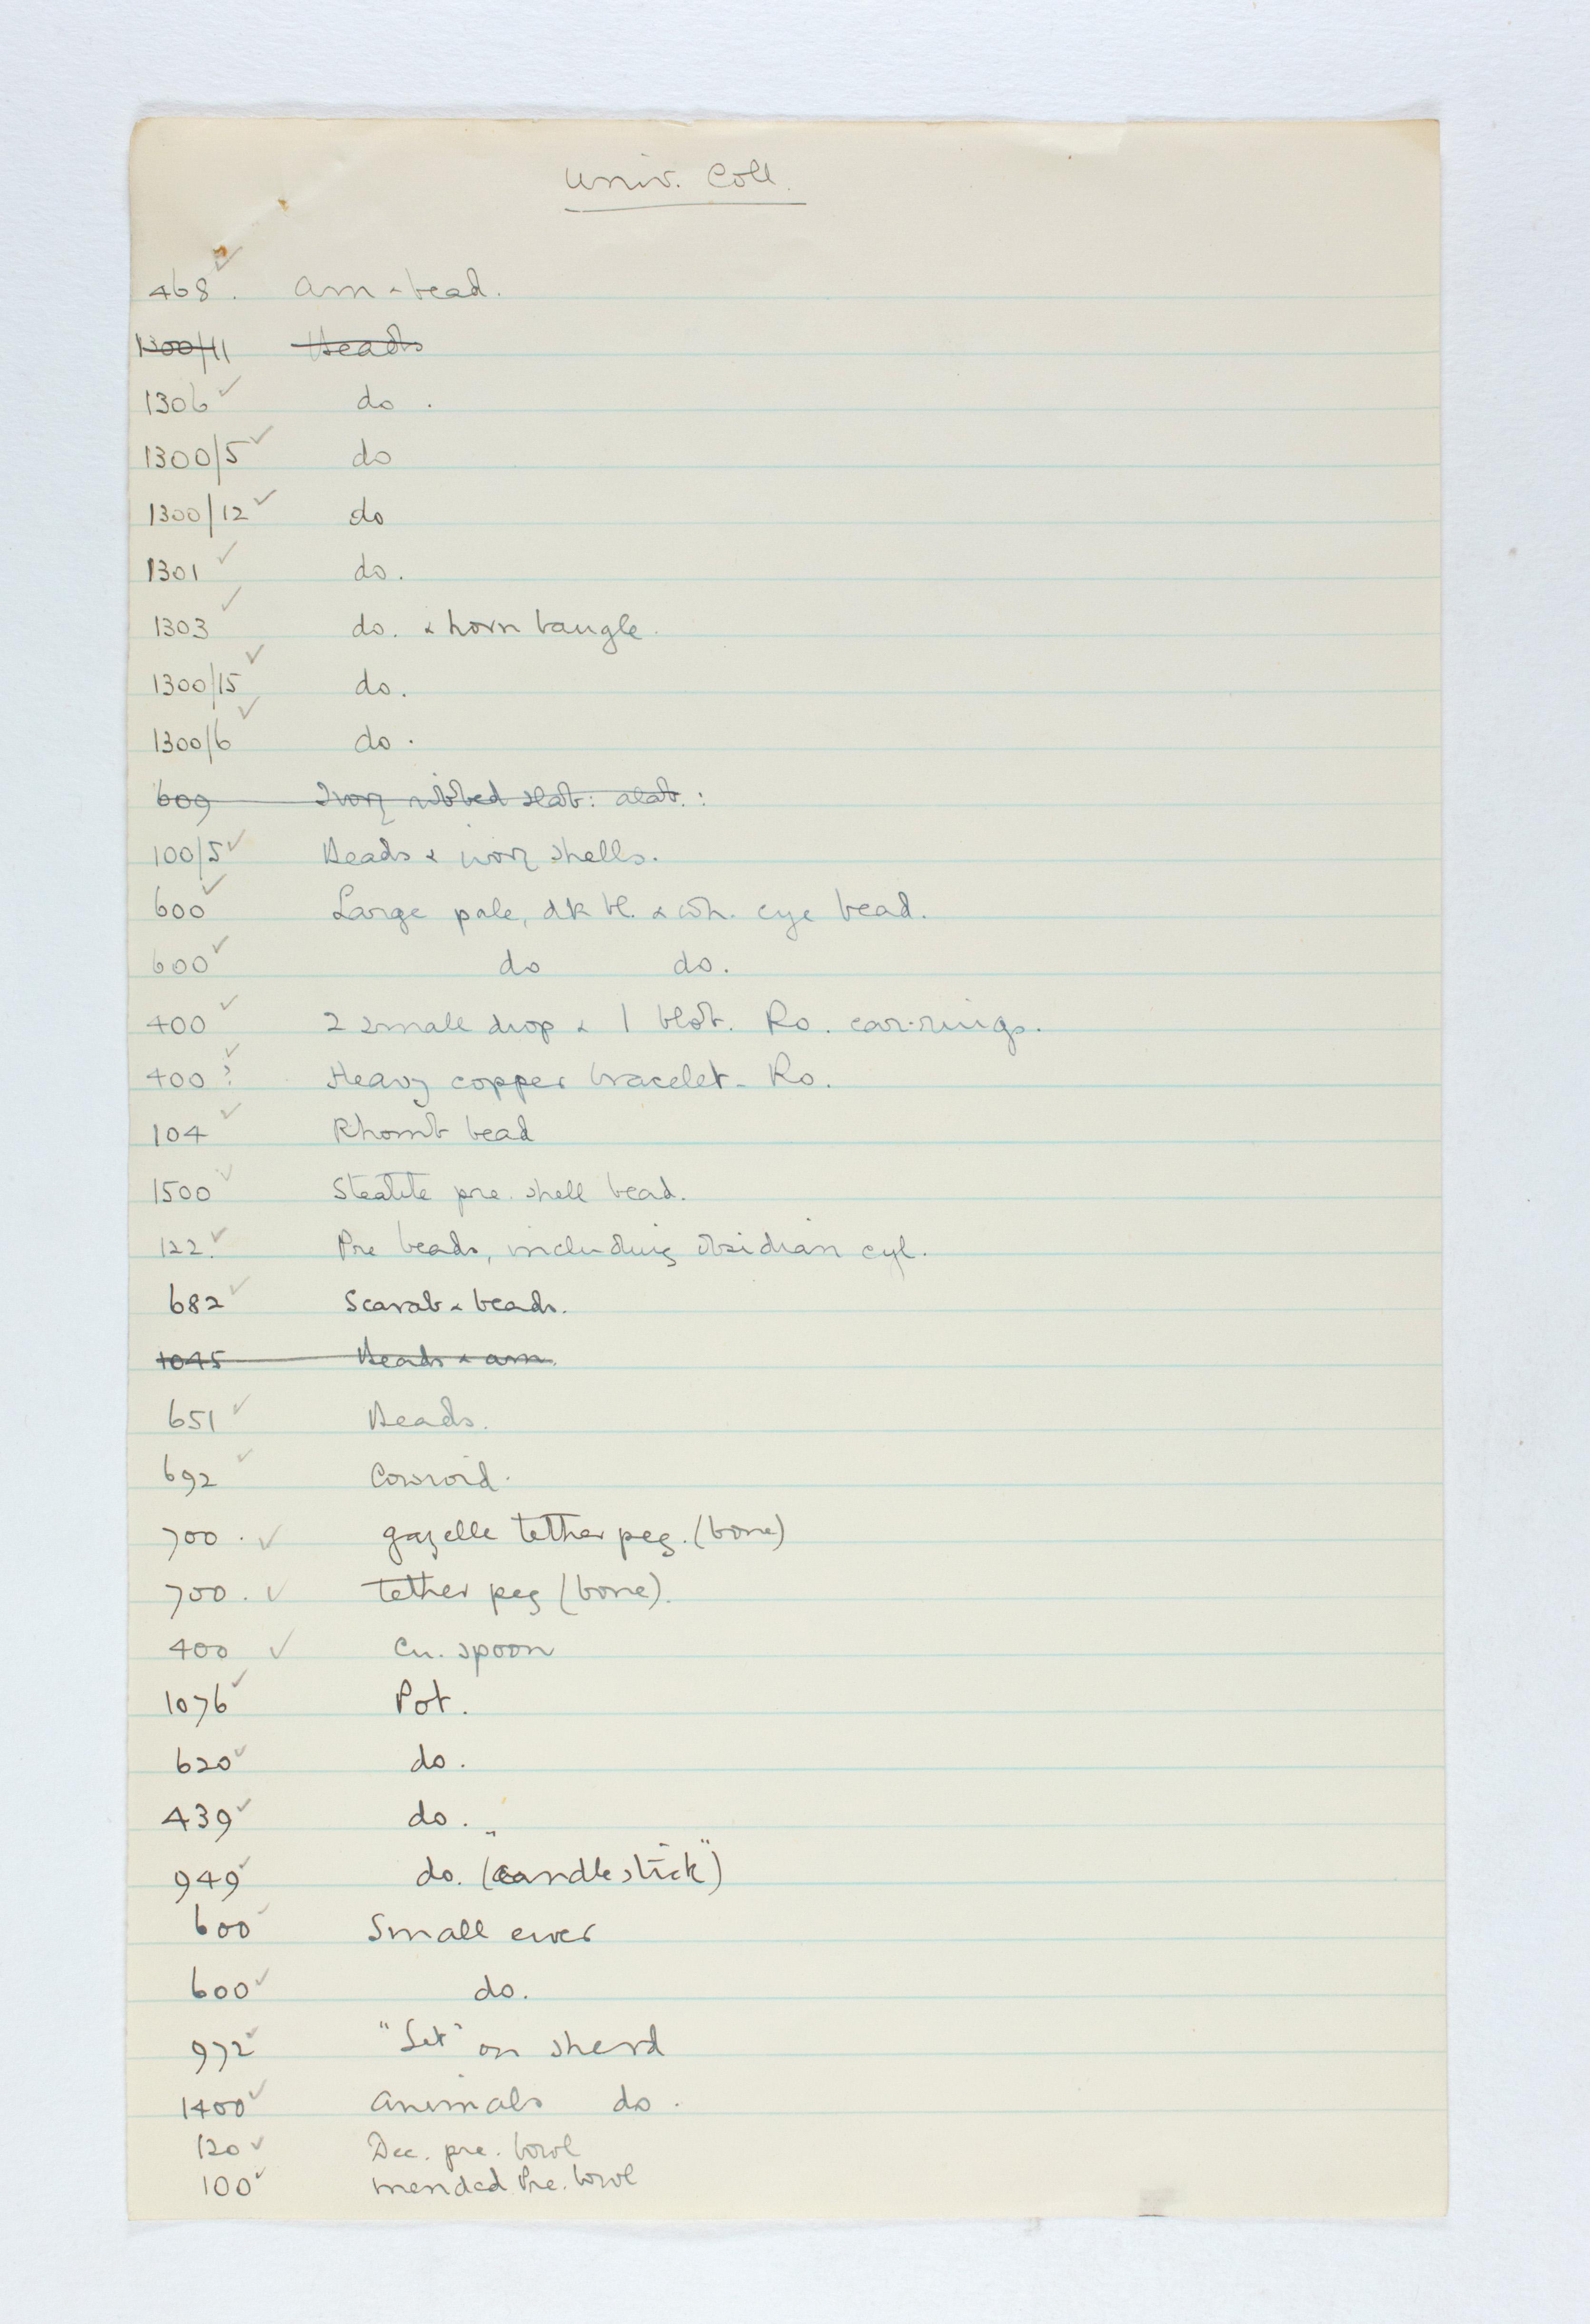 1922-23 Qau el-Kebir Individual institution list PMA/WFP1/D/26/17.5